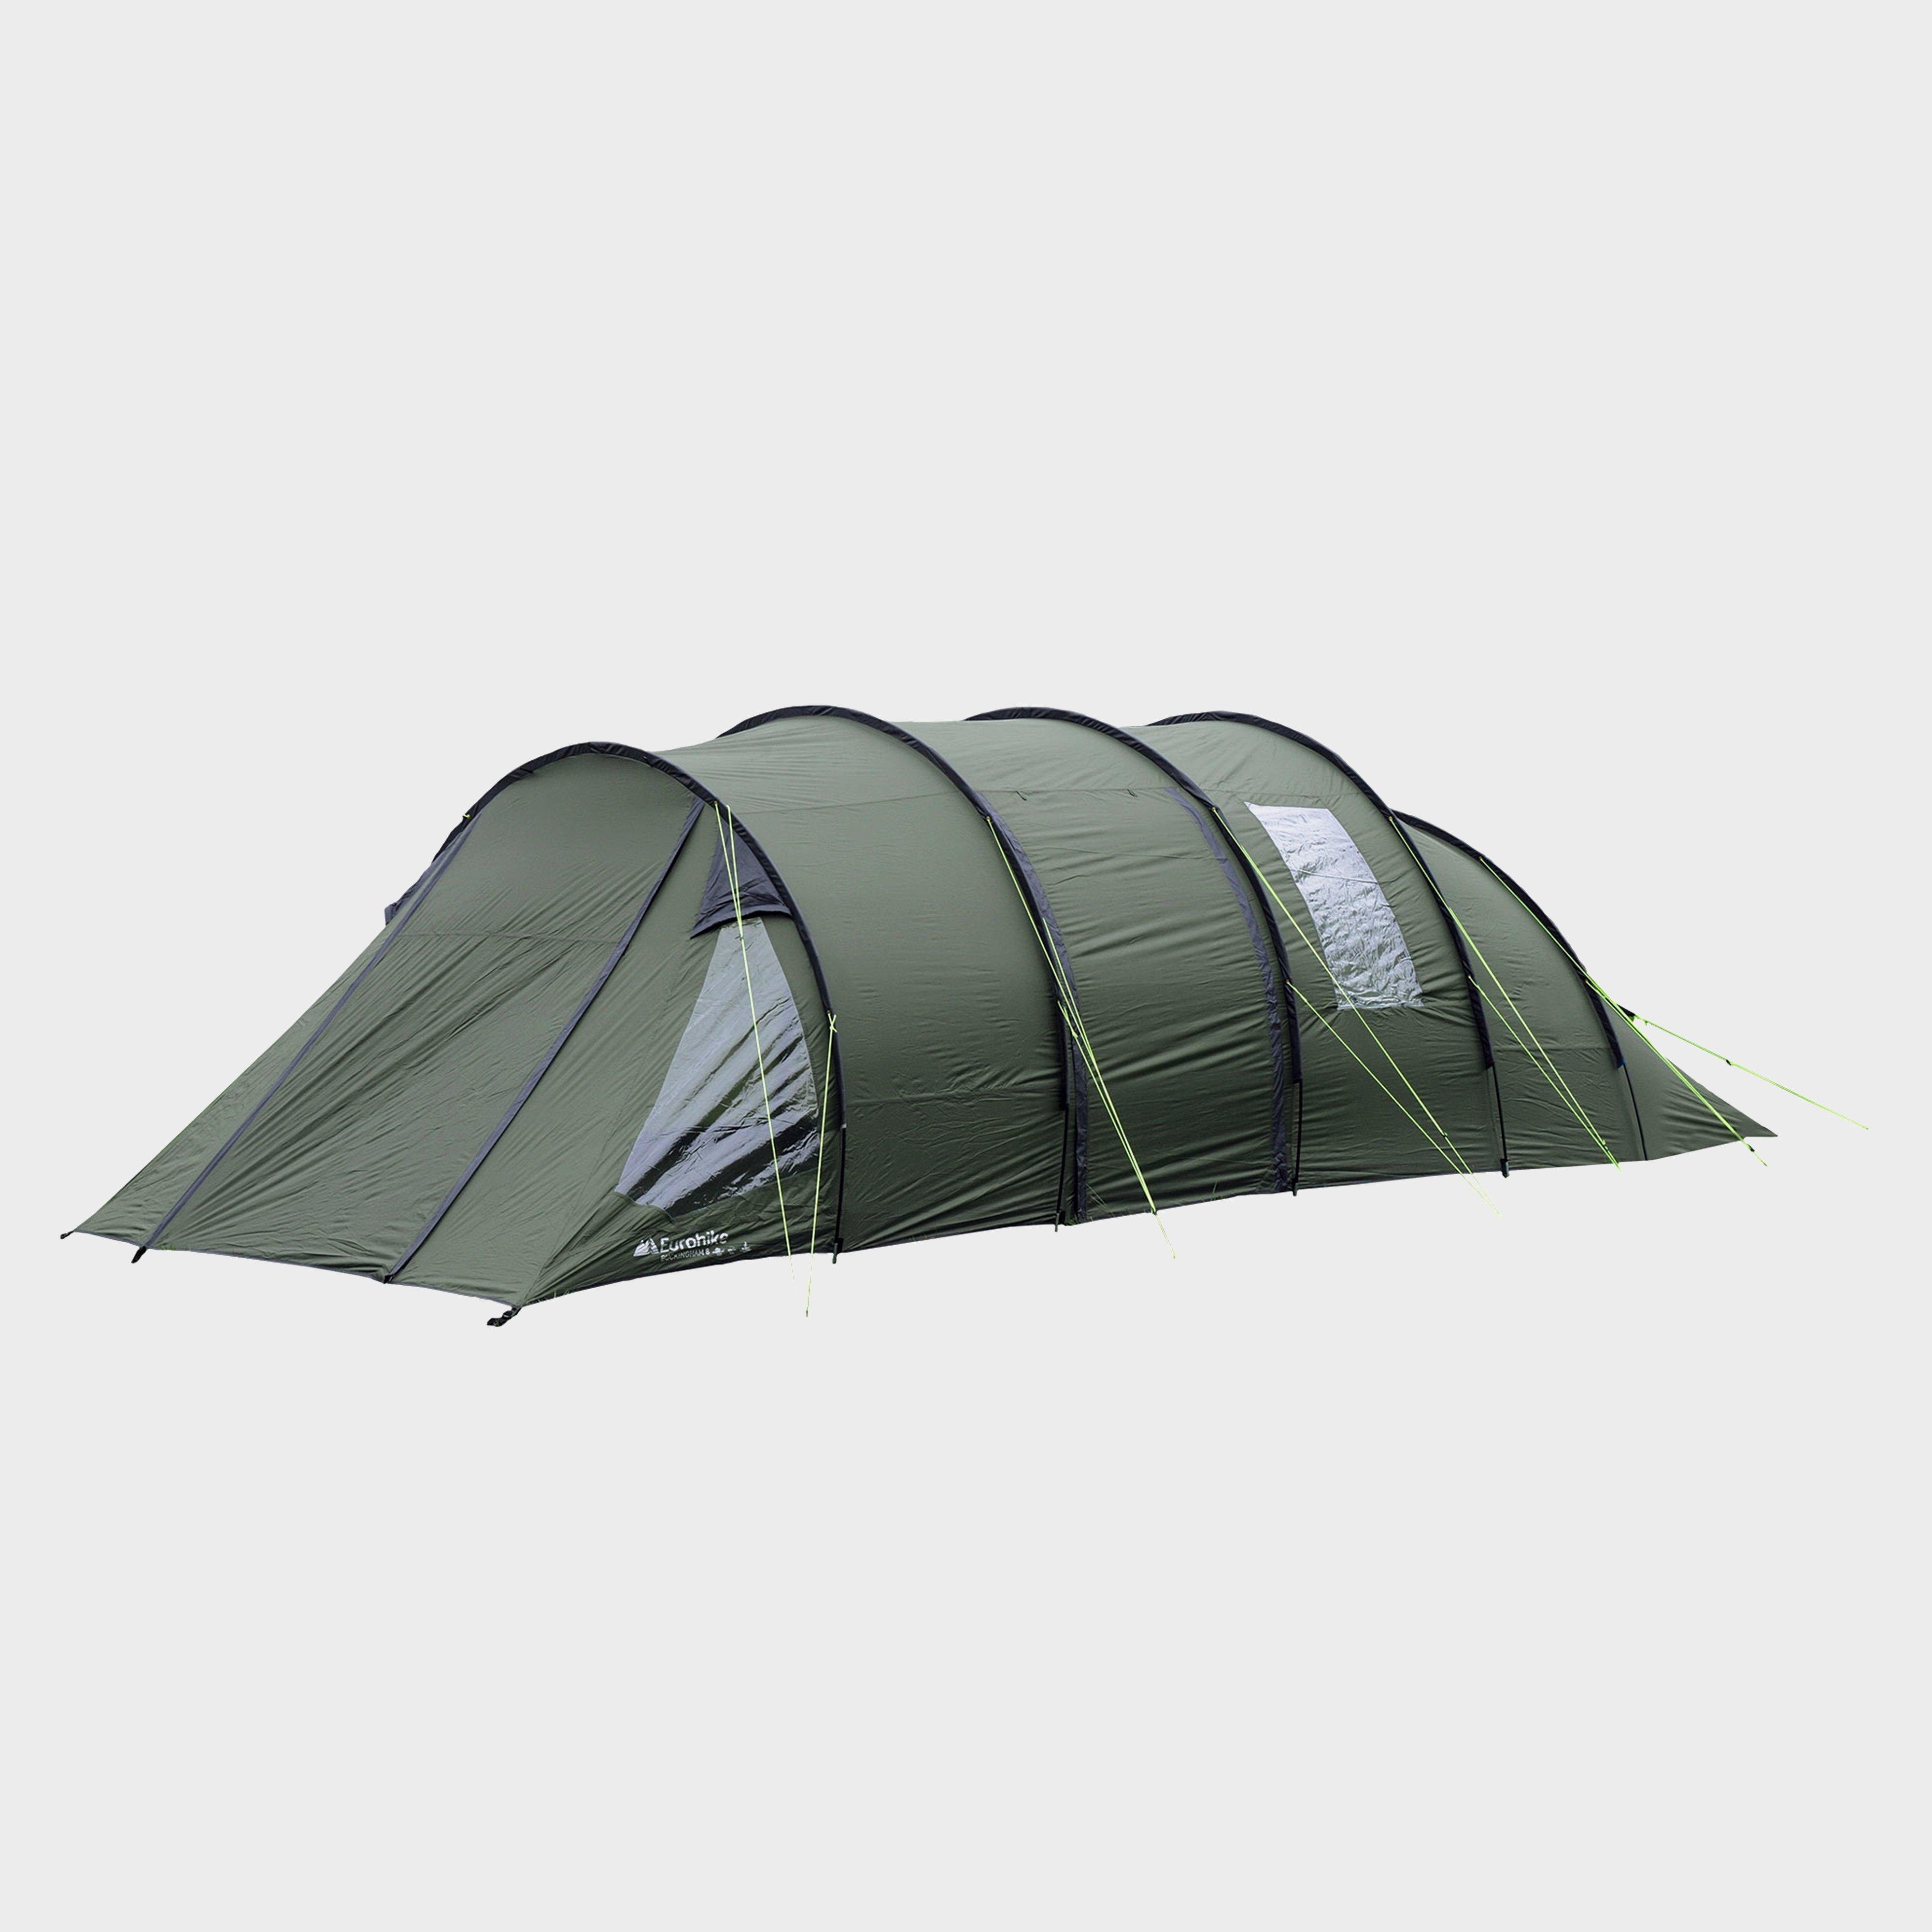 EUROHIKE Buckingham 8 Classic 8 Person Tent & Eurohike Tents u0026 Camping Equipment | Blacks